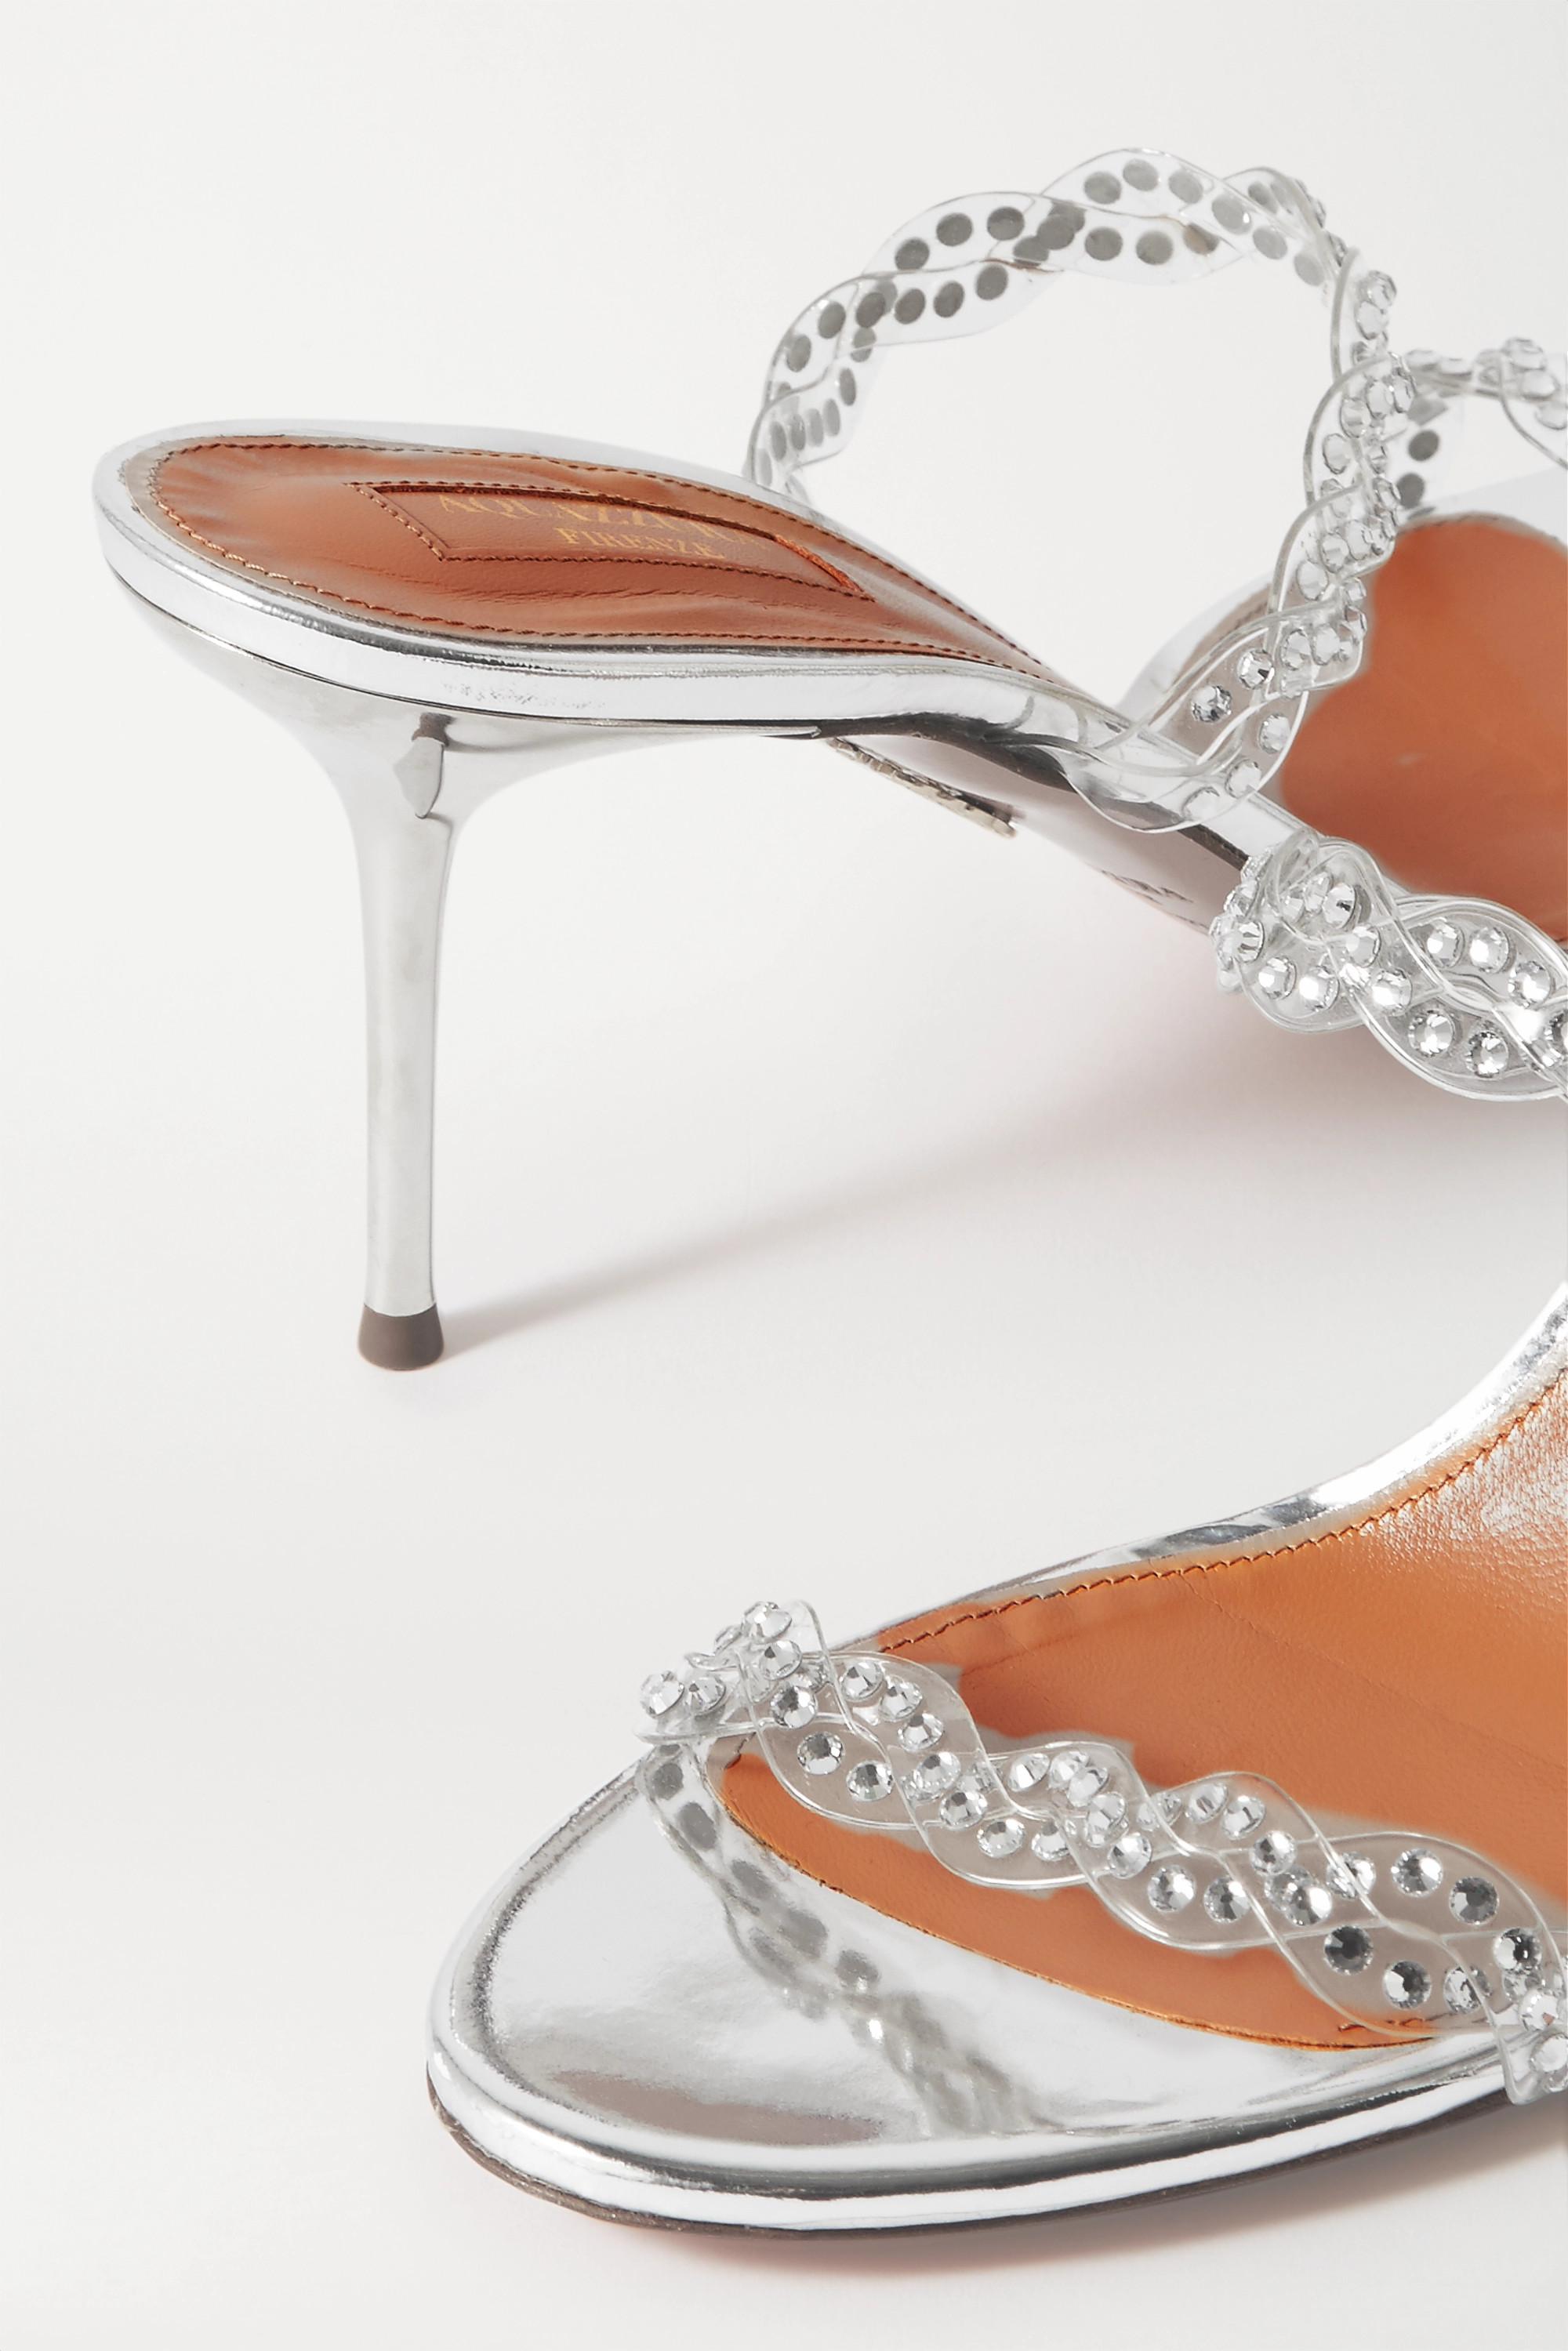 Aquazzura Heaven 75 Mules aus PVC und Metallic-Leder mit Kristallen